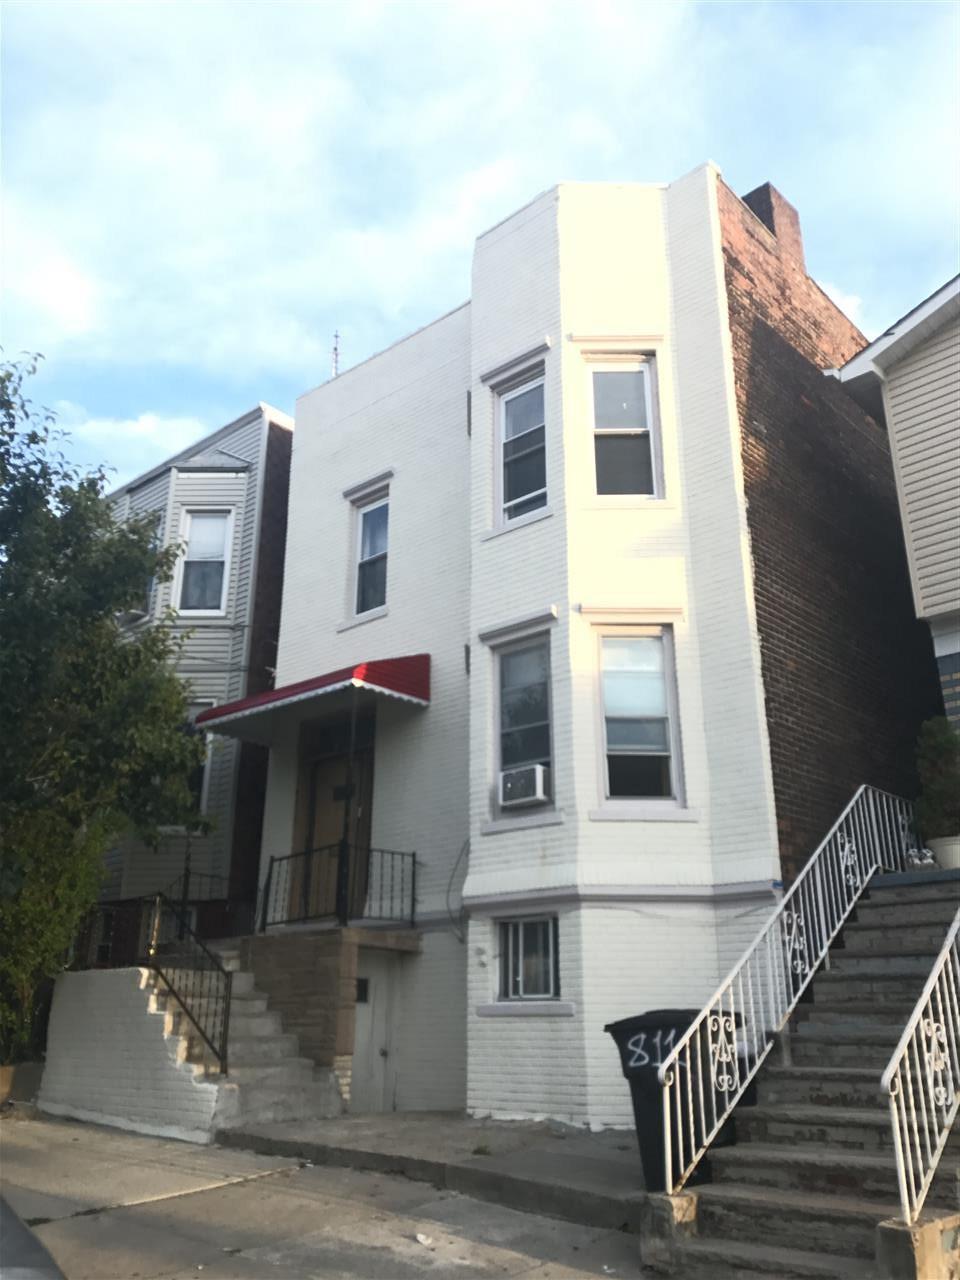 809 SECAUCUS RD, JC, Heights, NJ 07307